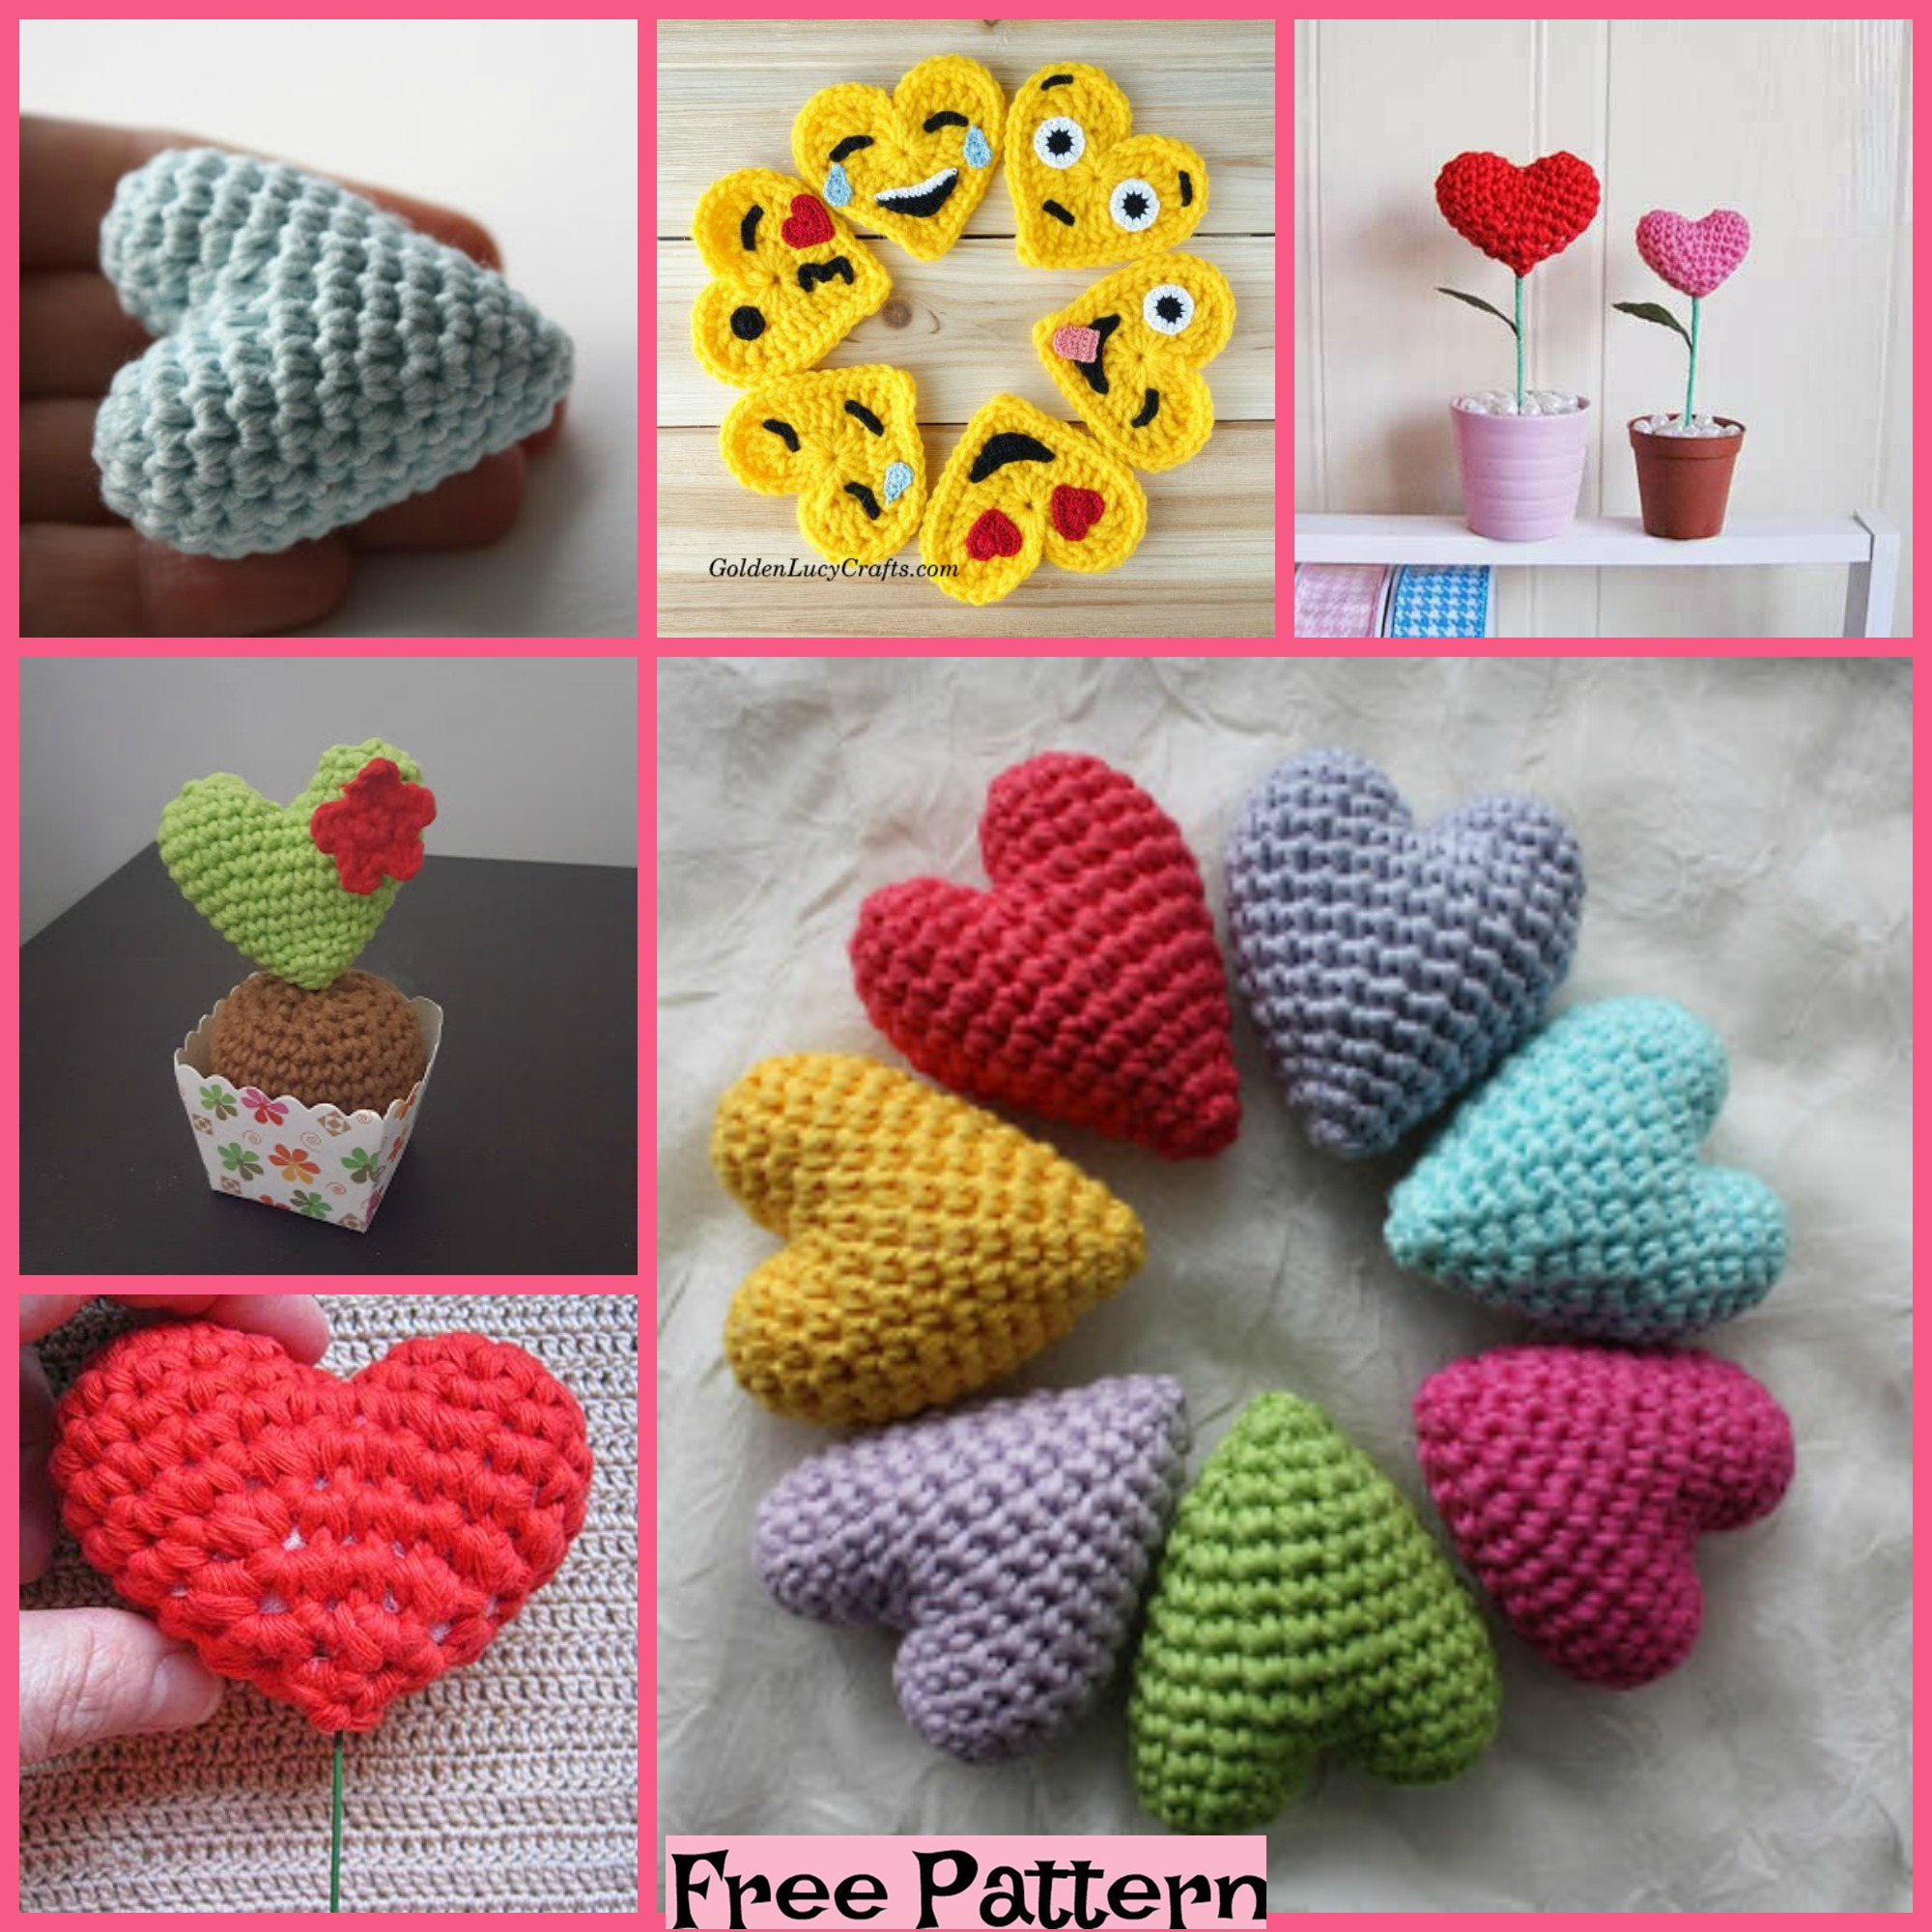 diy4ever-Crochet Valentine Heart - Free Patterns